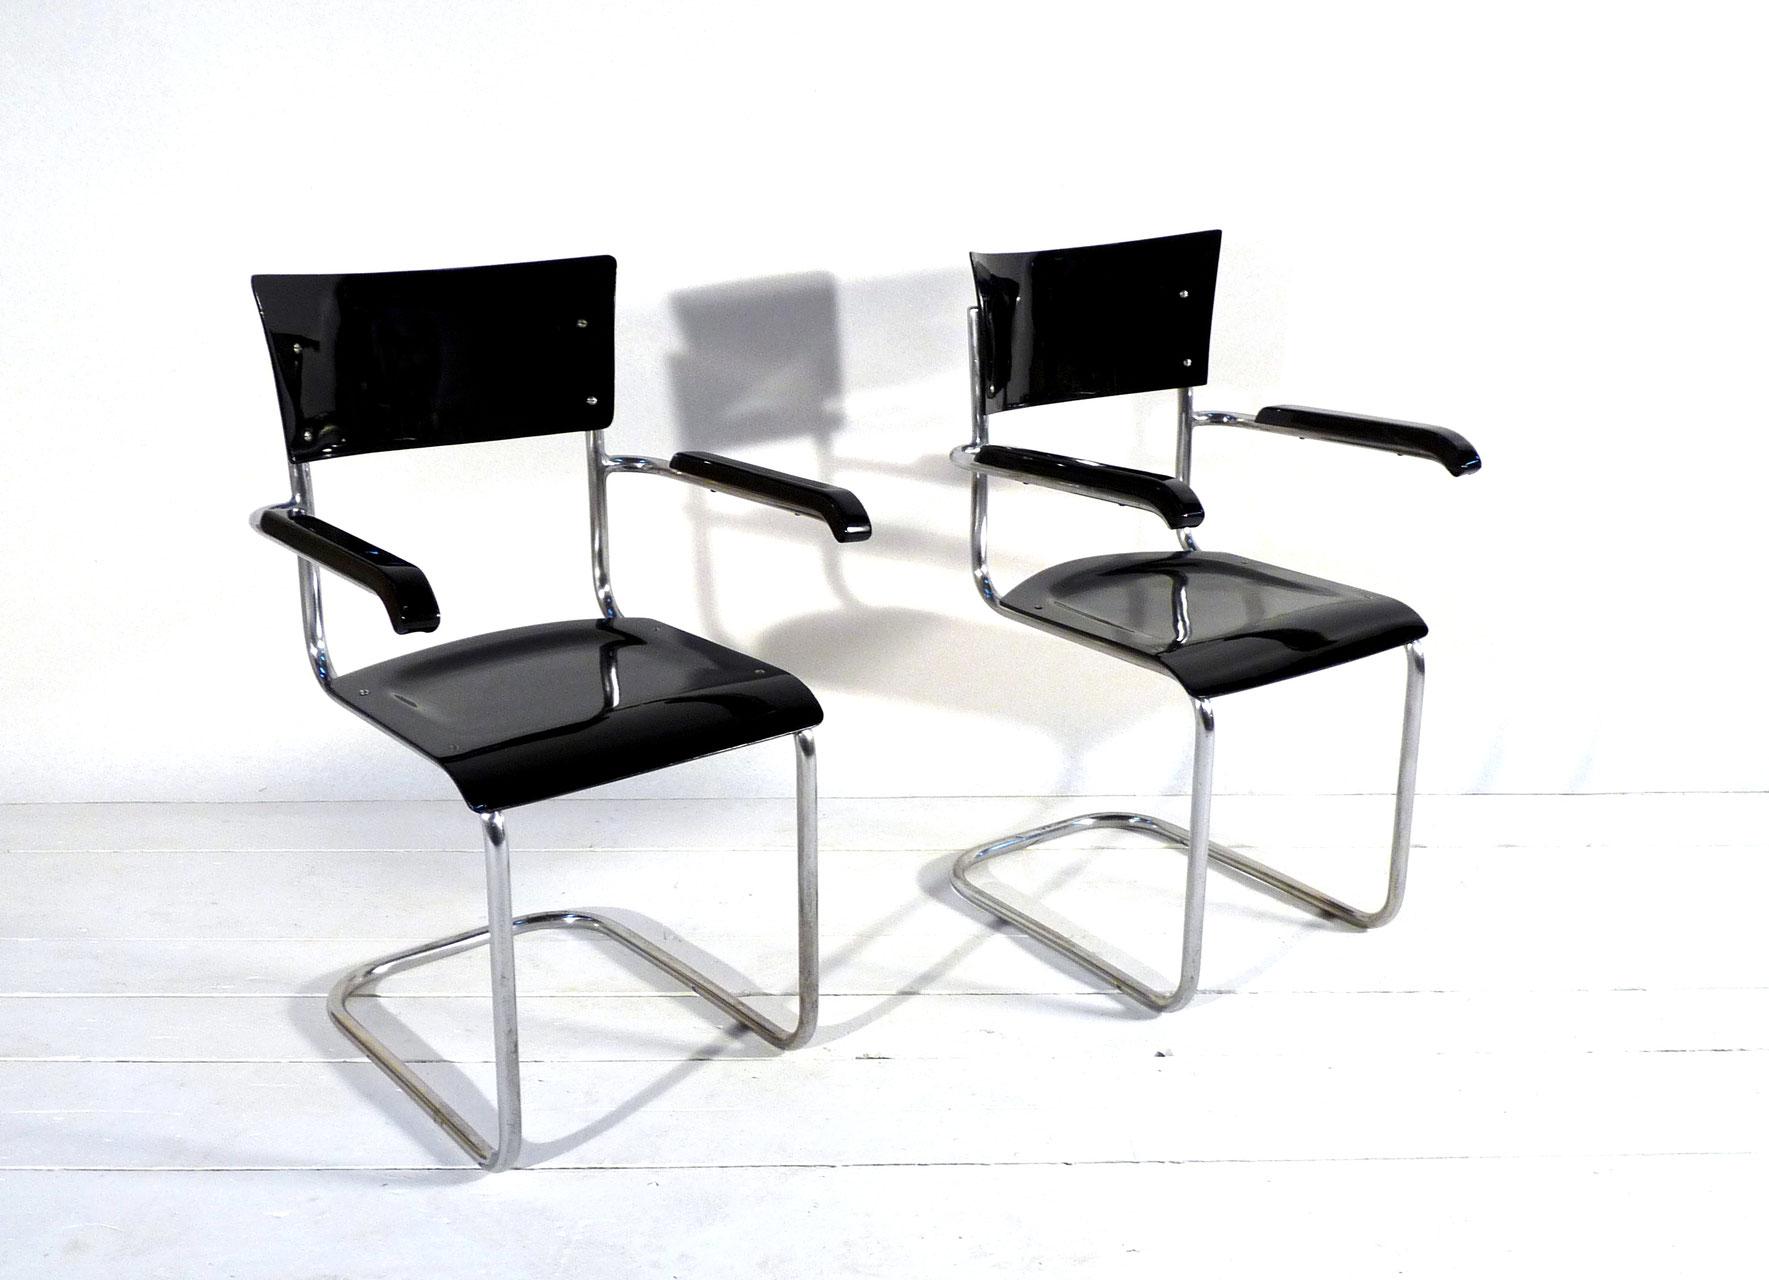 bauhaus originale bauhaus m bel sessel stuhl sofa lampe von ferdinand christall. Black Bedroom Furniture Sets. Home Design Ideas